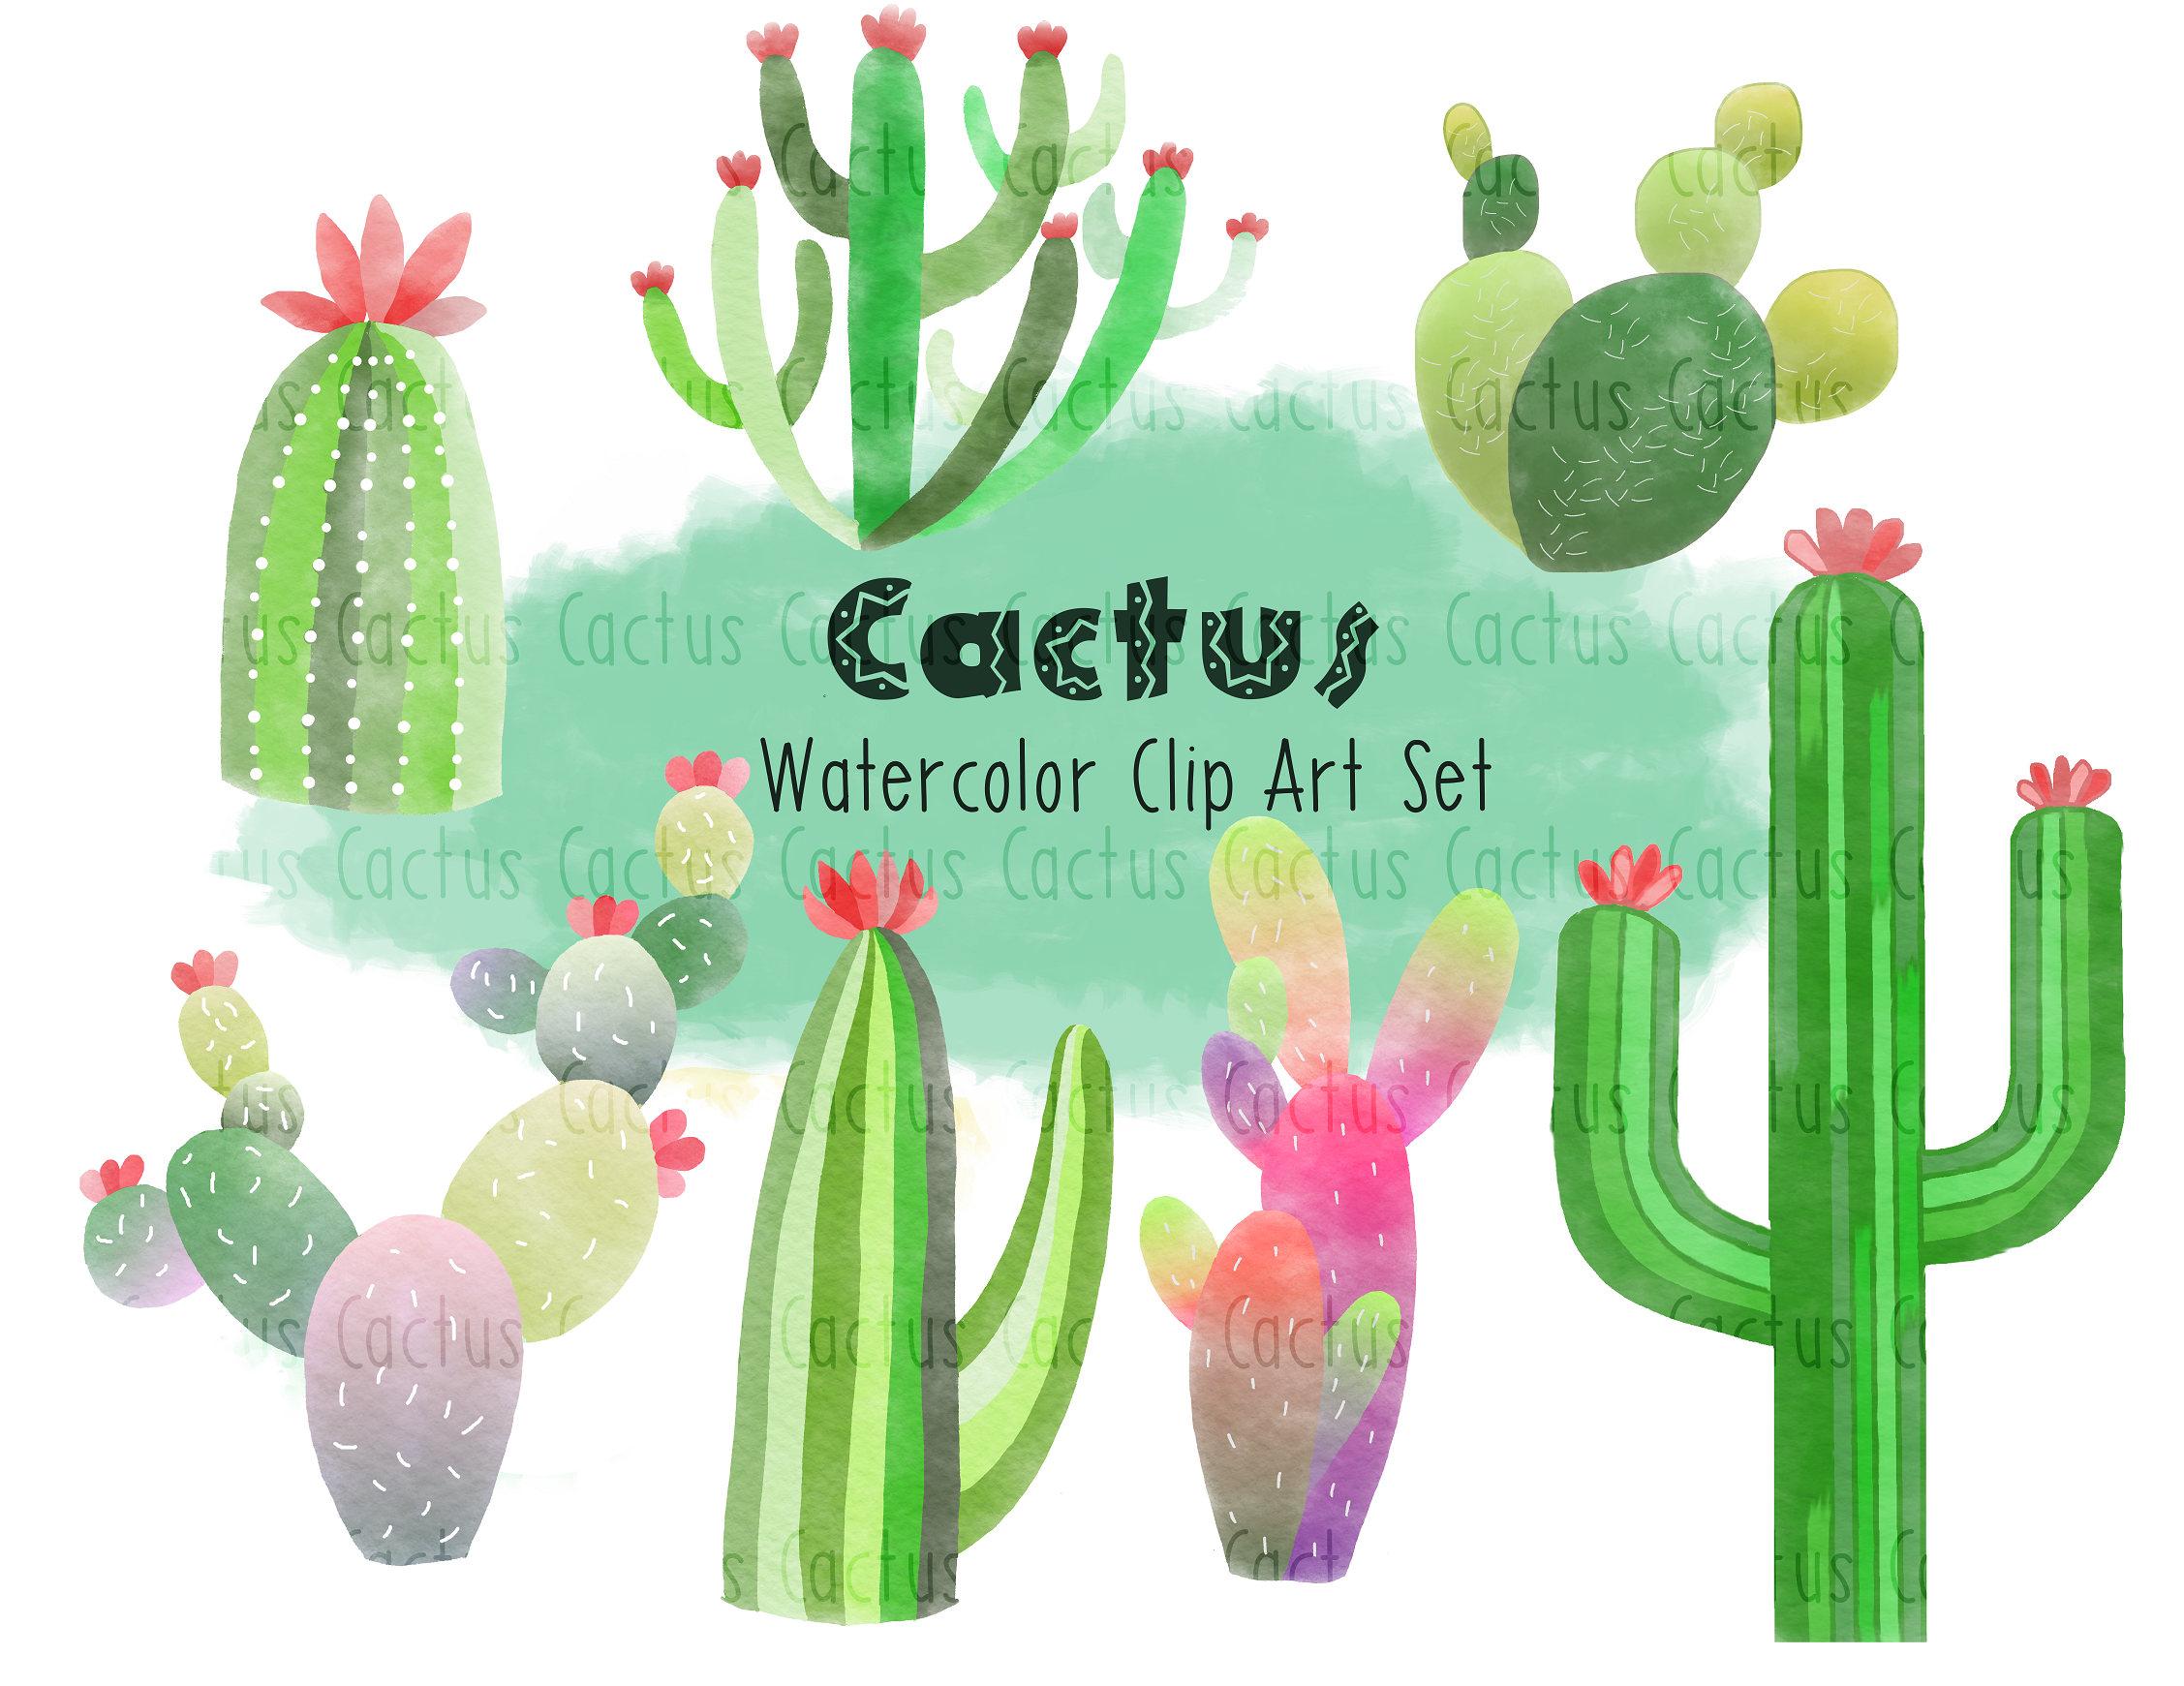 2255x1741 Watercolor Cactus Clip Art Cactus Clip Art Succulent Clip Art